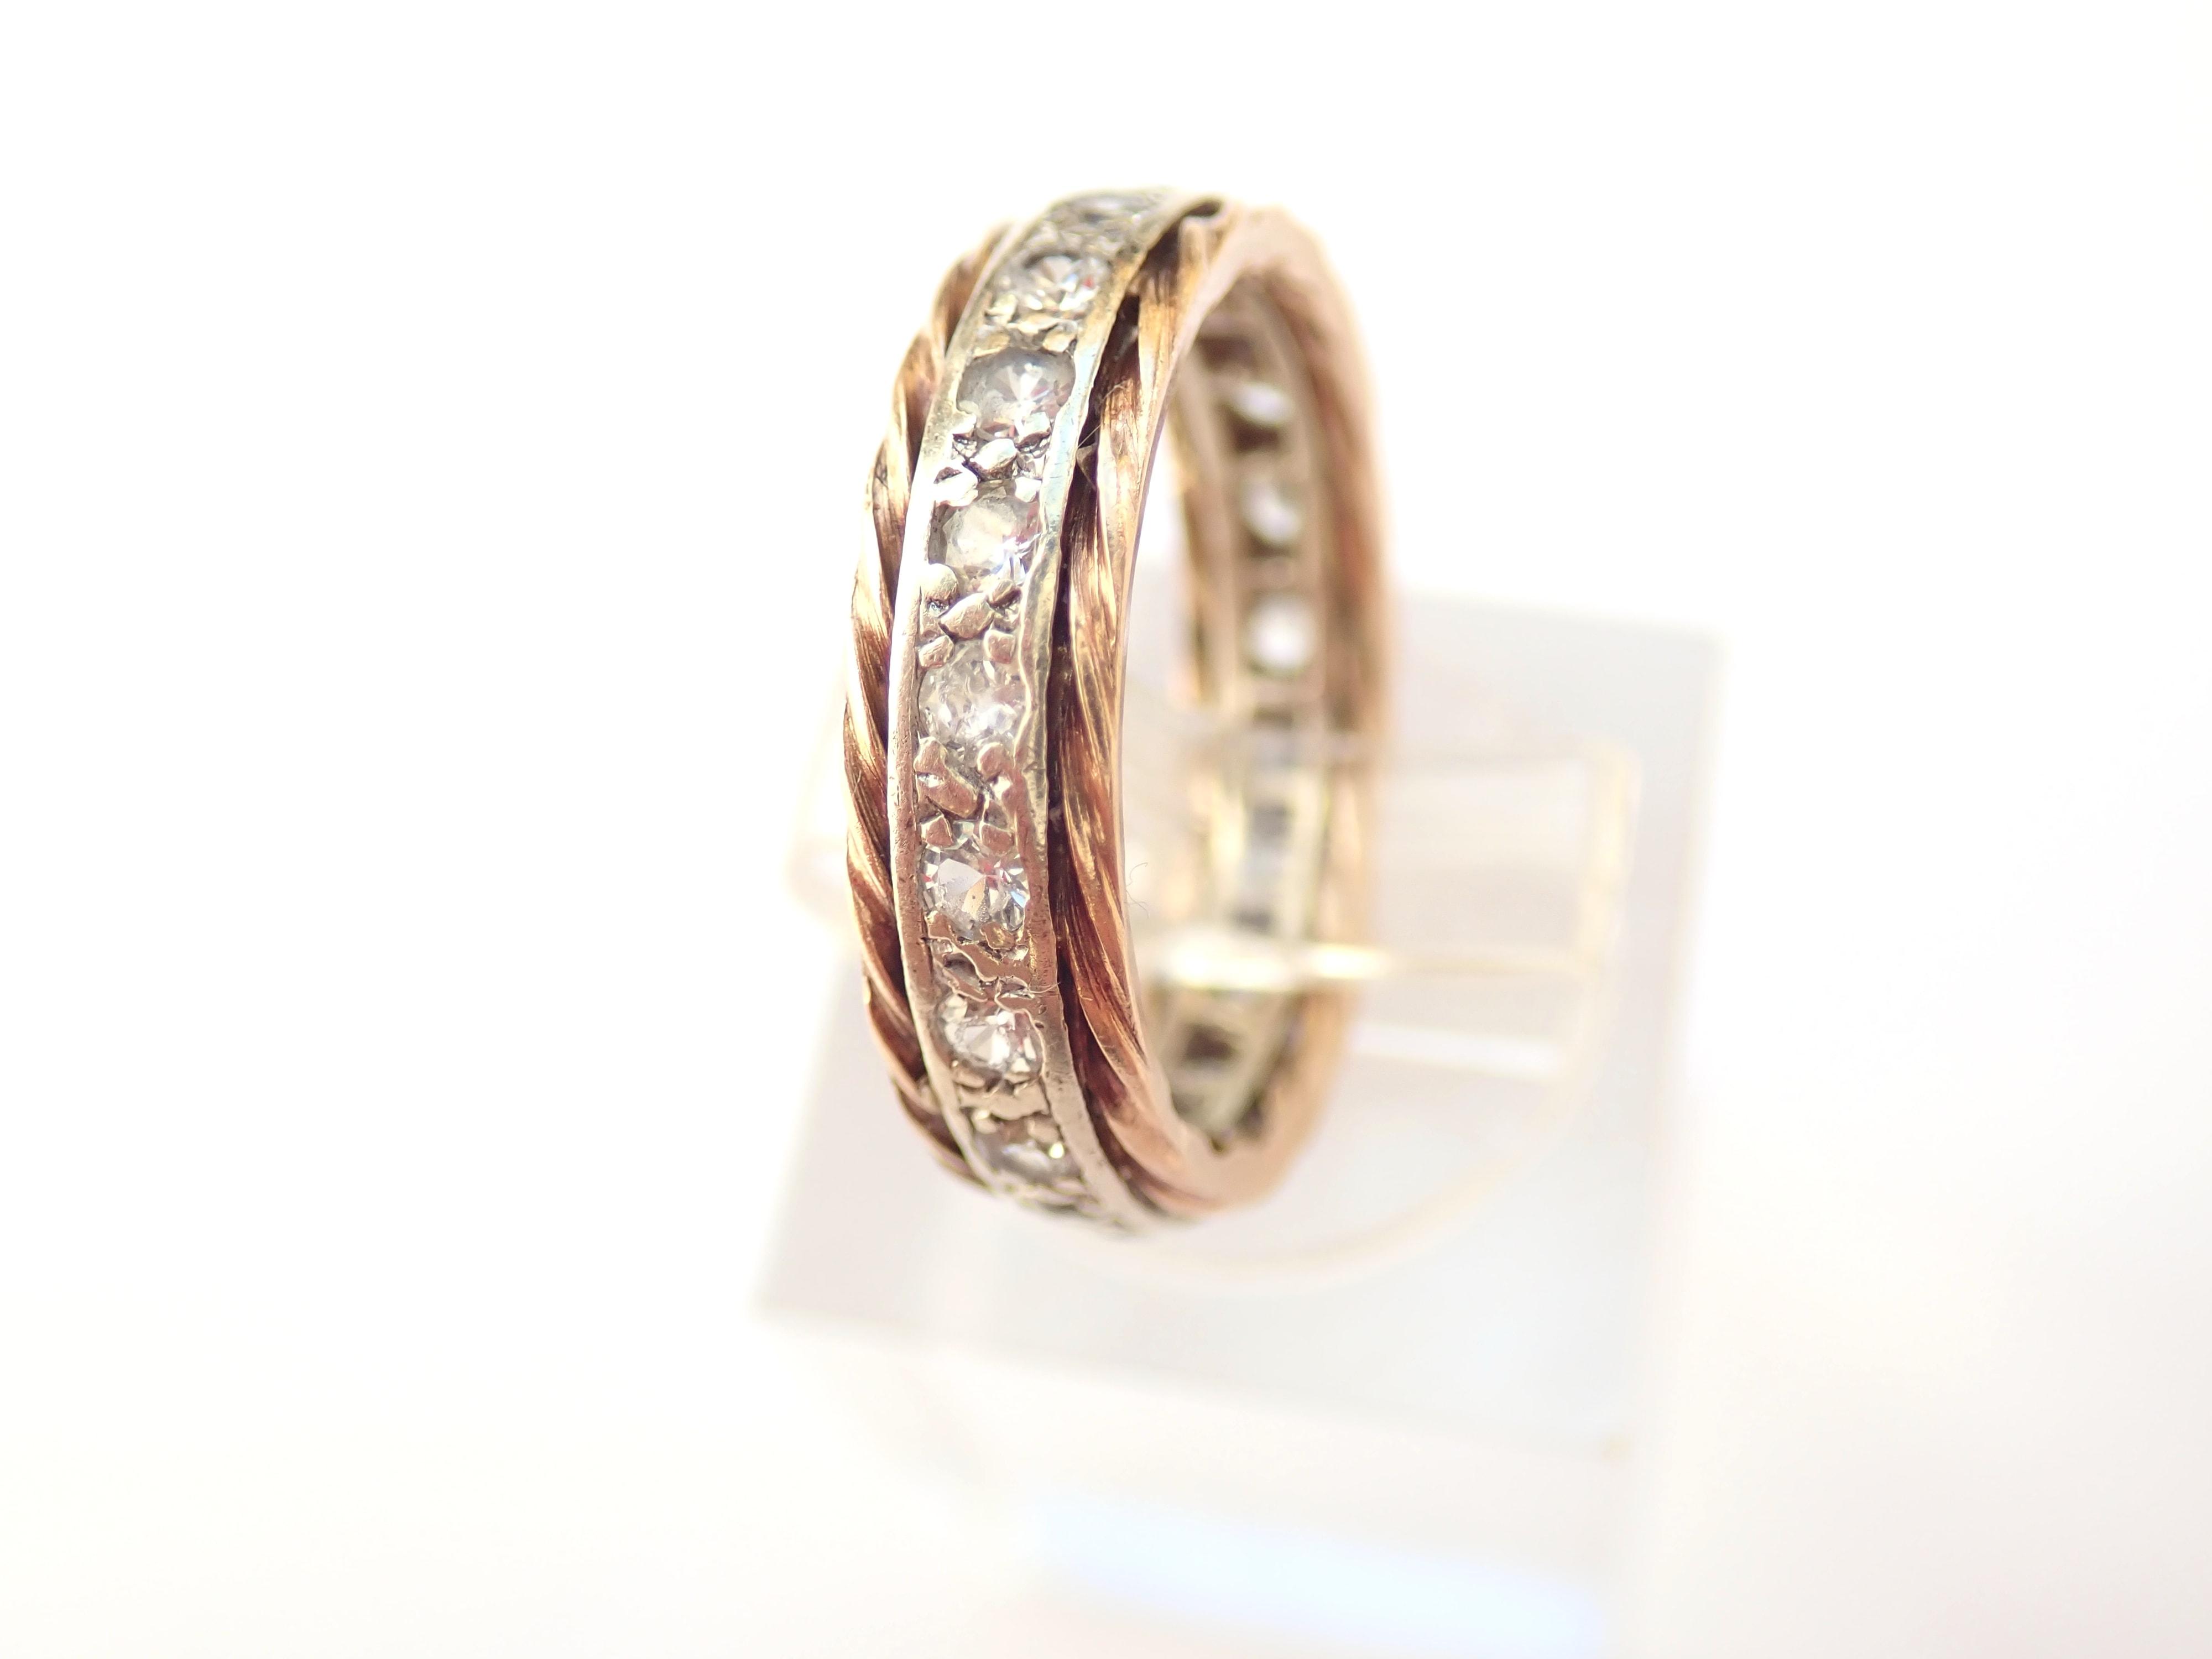 375 9ct Yellow Gold Cubic Zirconia Full Eternity Ring Size K – 3.1gms #50